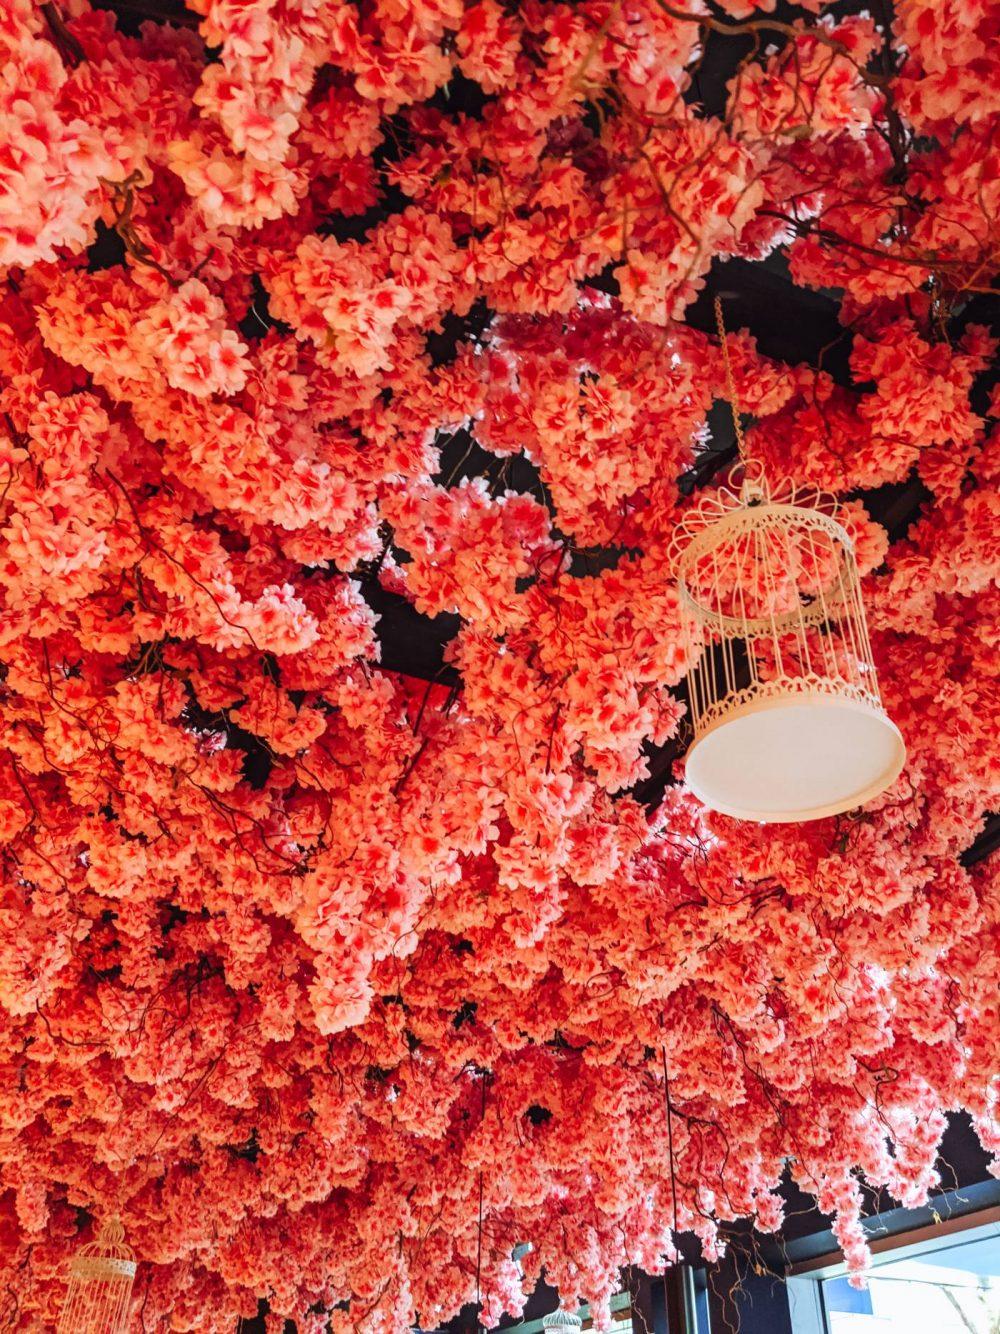 Cherry blossom ceiling at The Blossom Room Milton Keynes